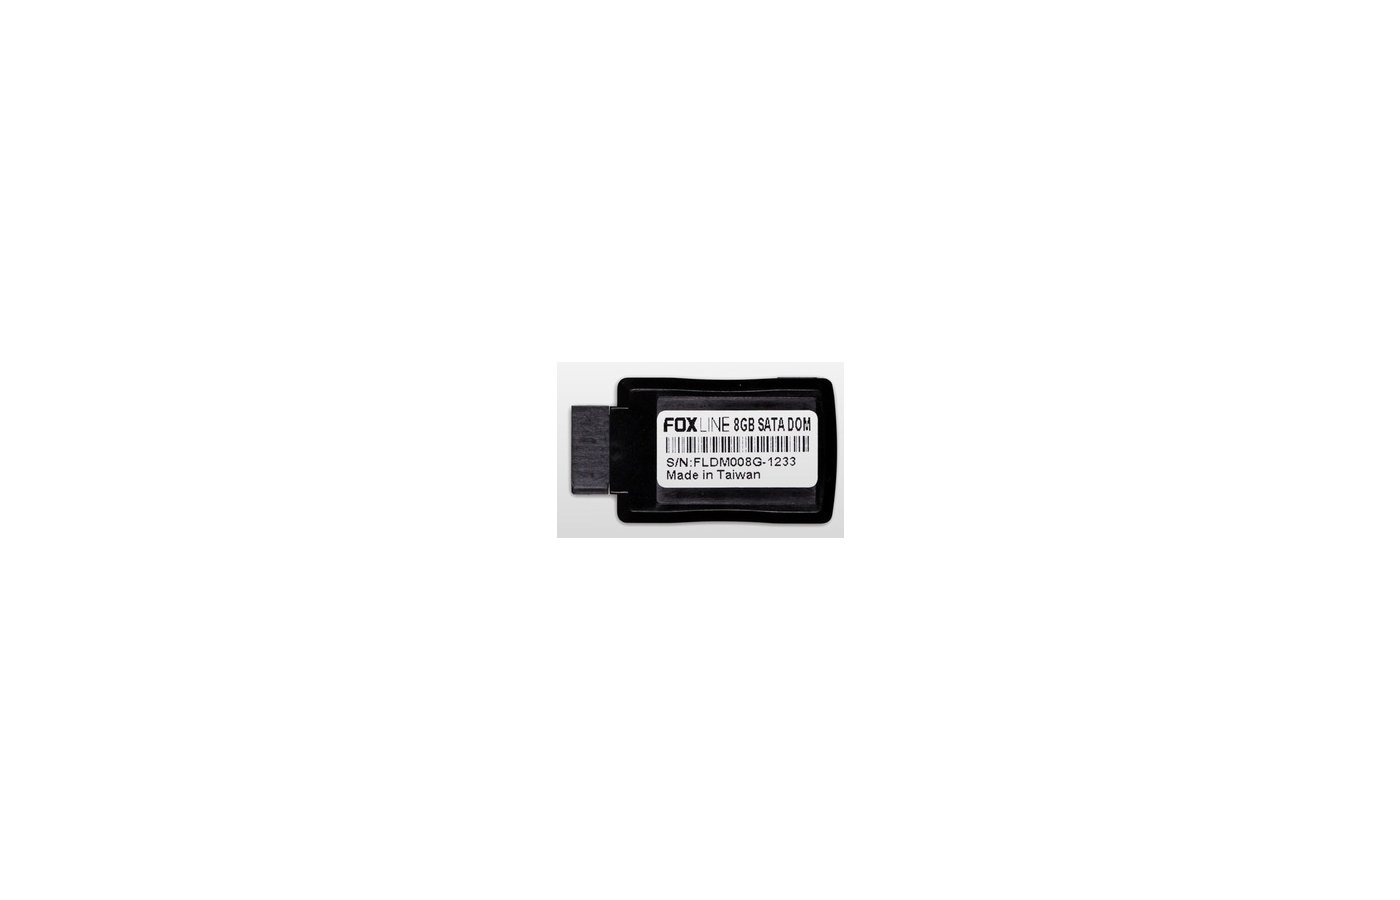 SSD жесткий диск Foxline 8GB Module 7-pin SATA, MLC FLDM008G